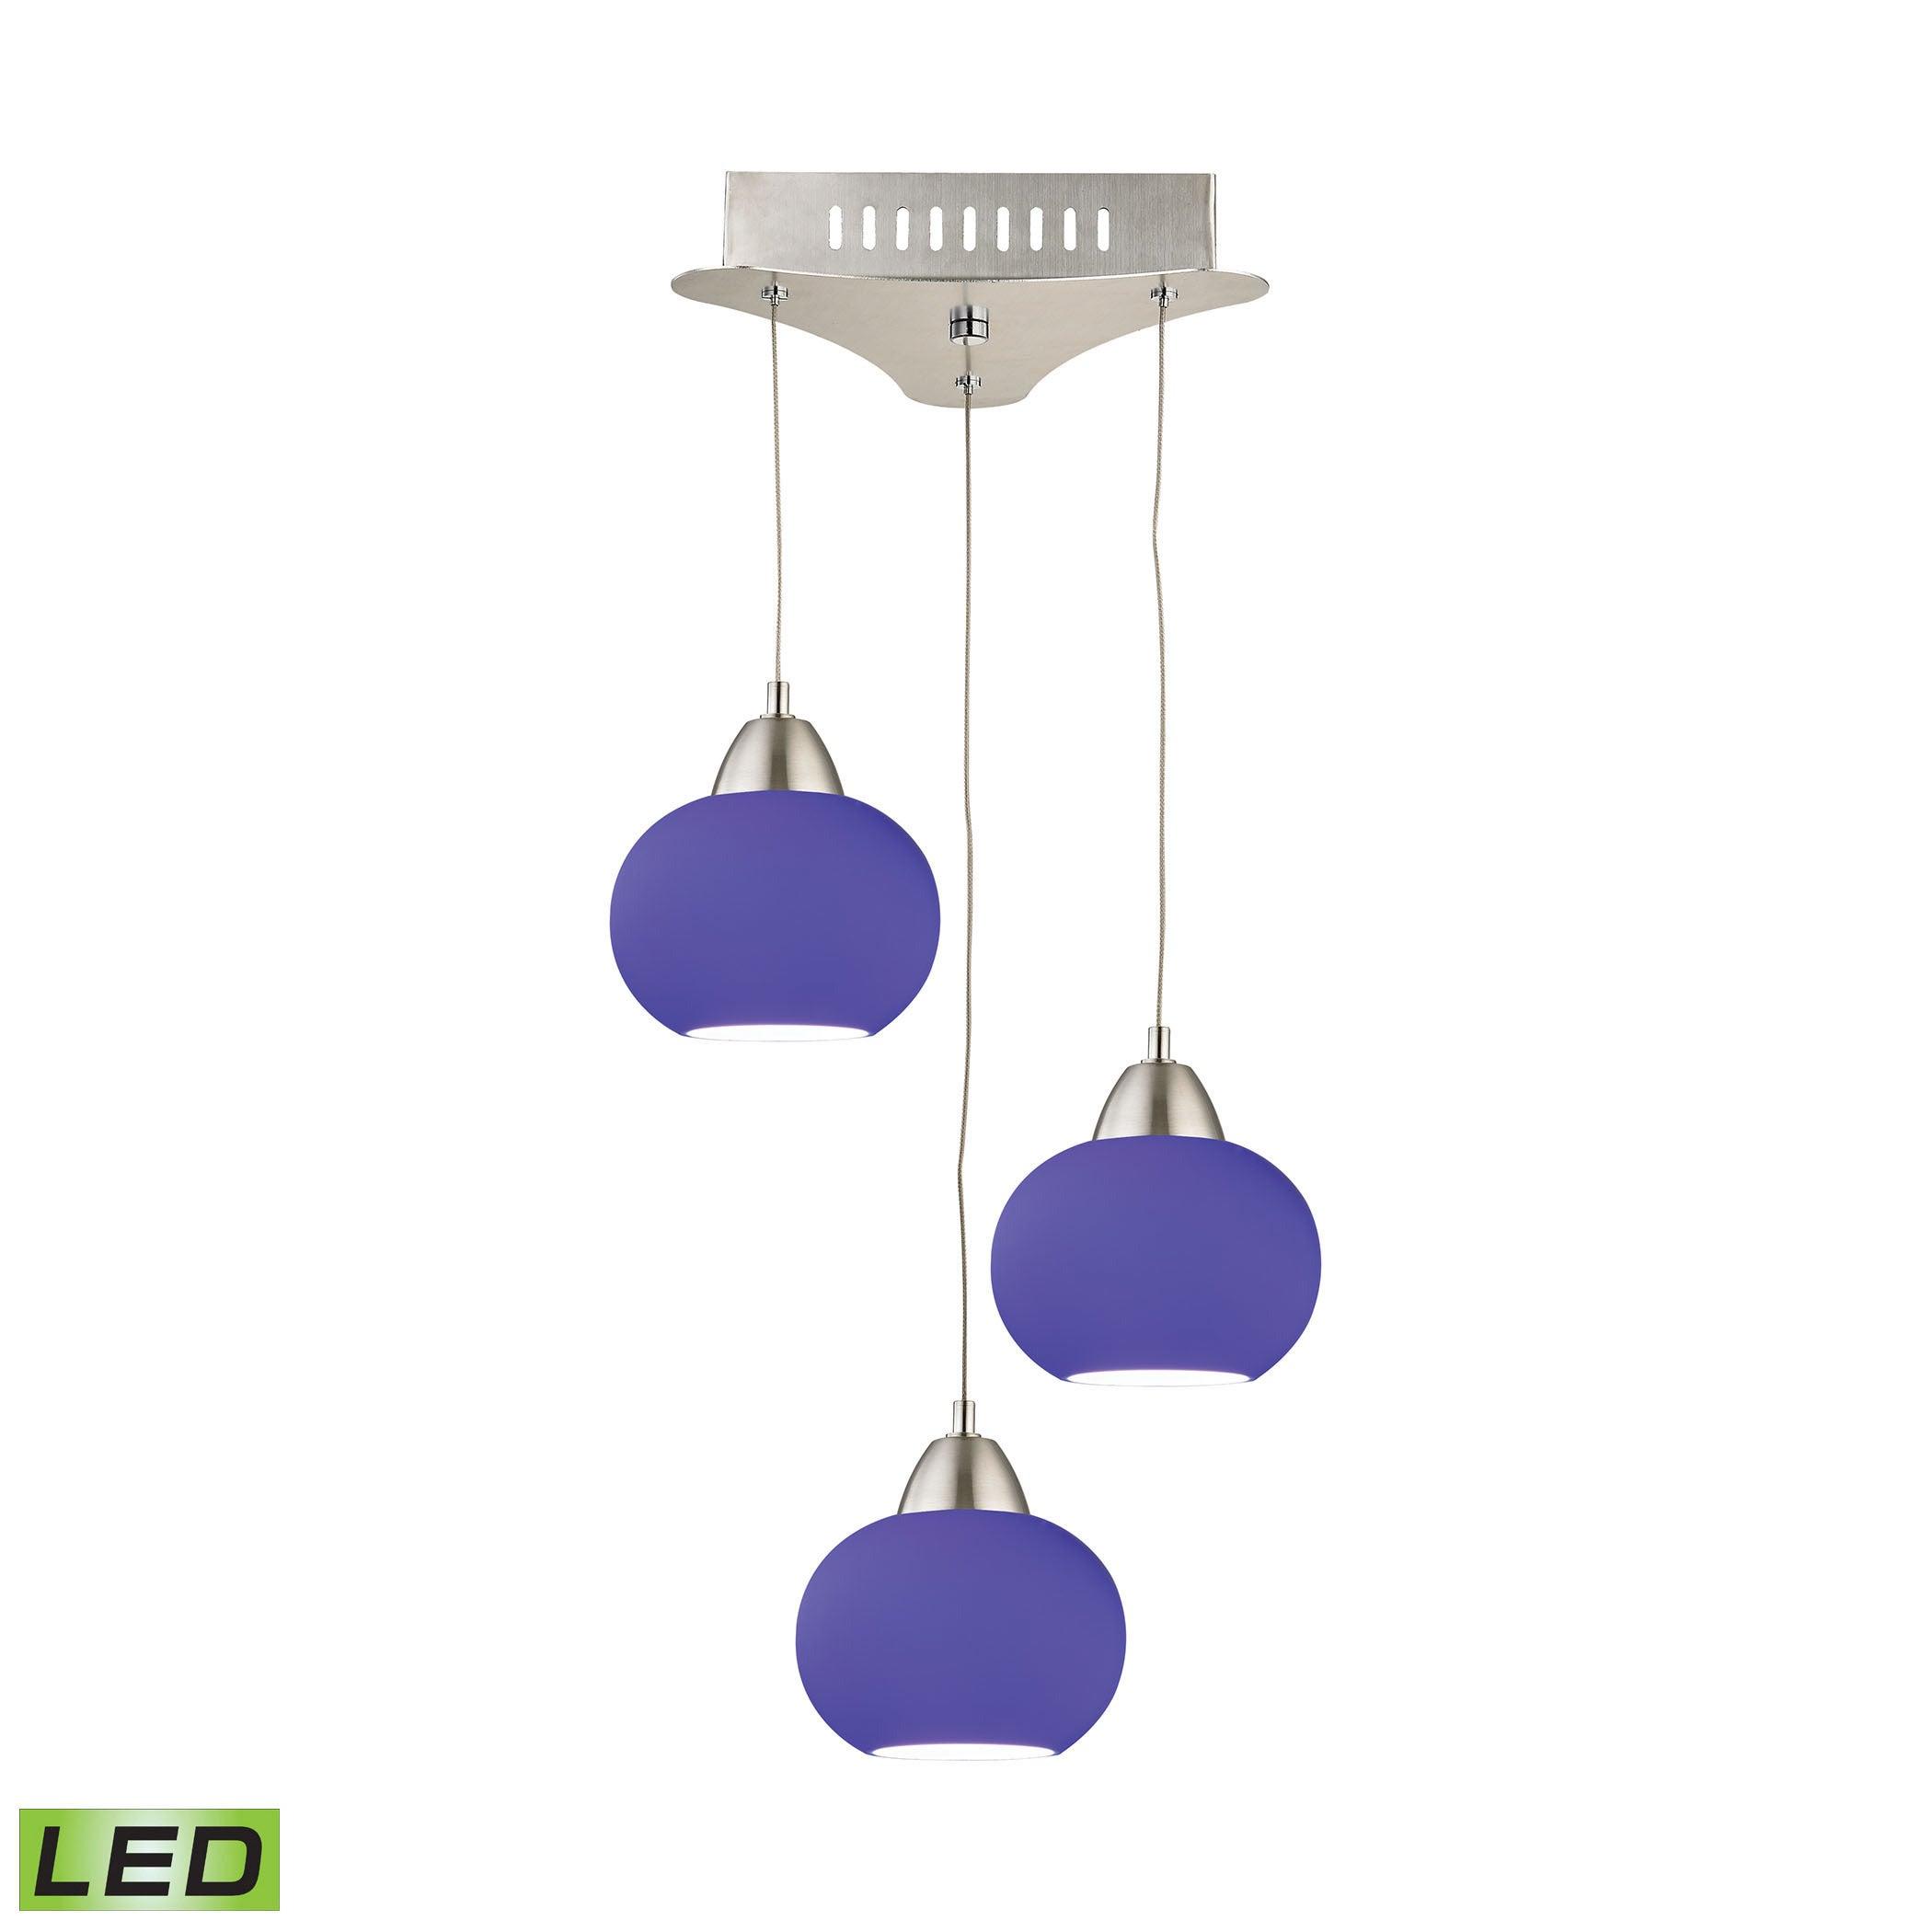 Satin Nickel Elk Lighting LCA403-7-16M Ciotola 3 Light LED Pendant with Blue Glass